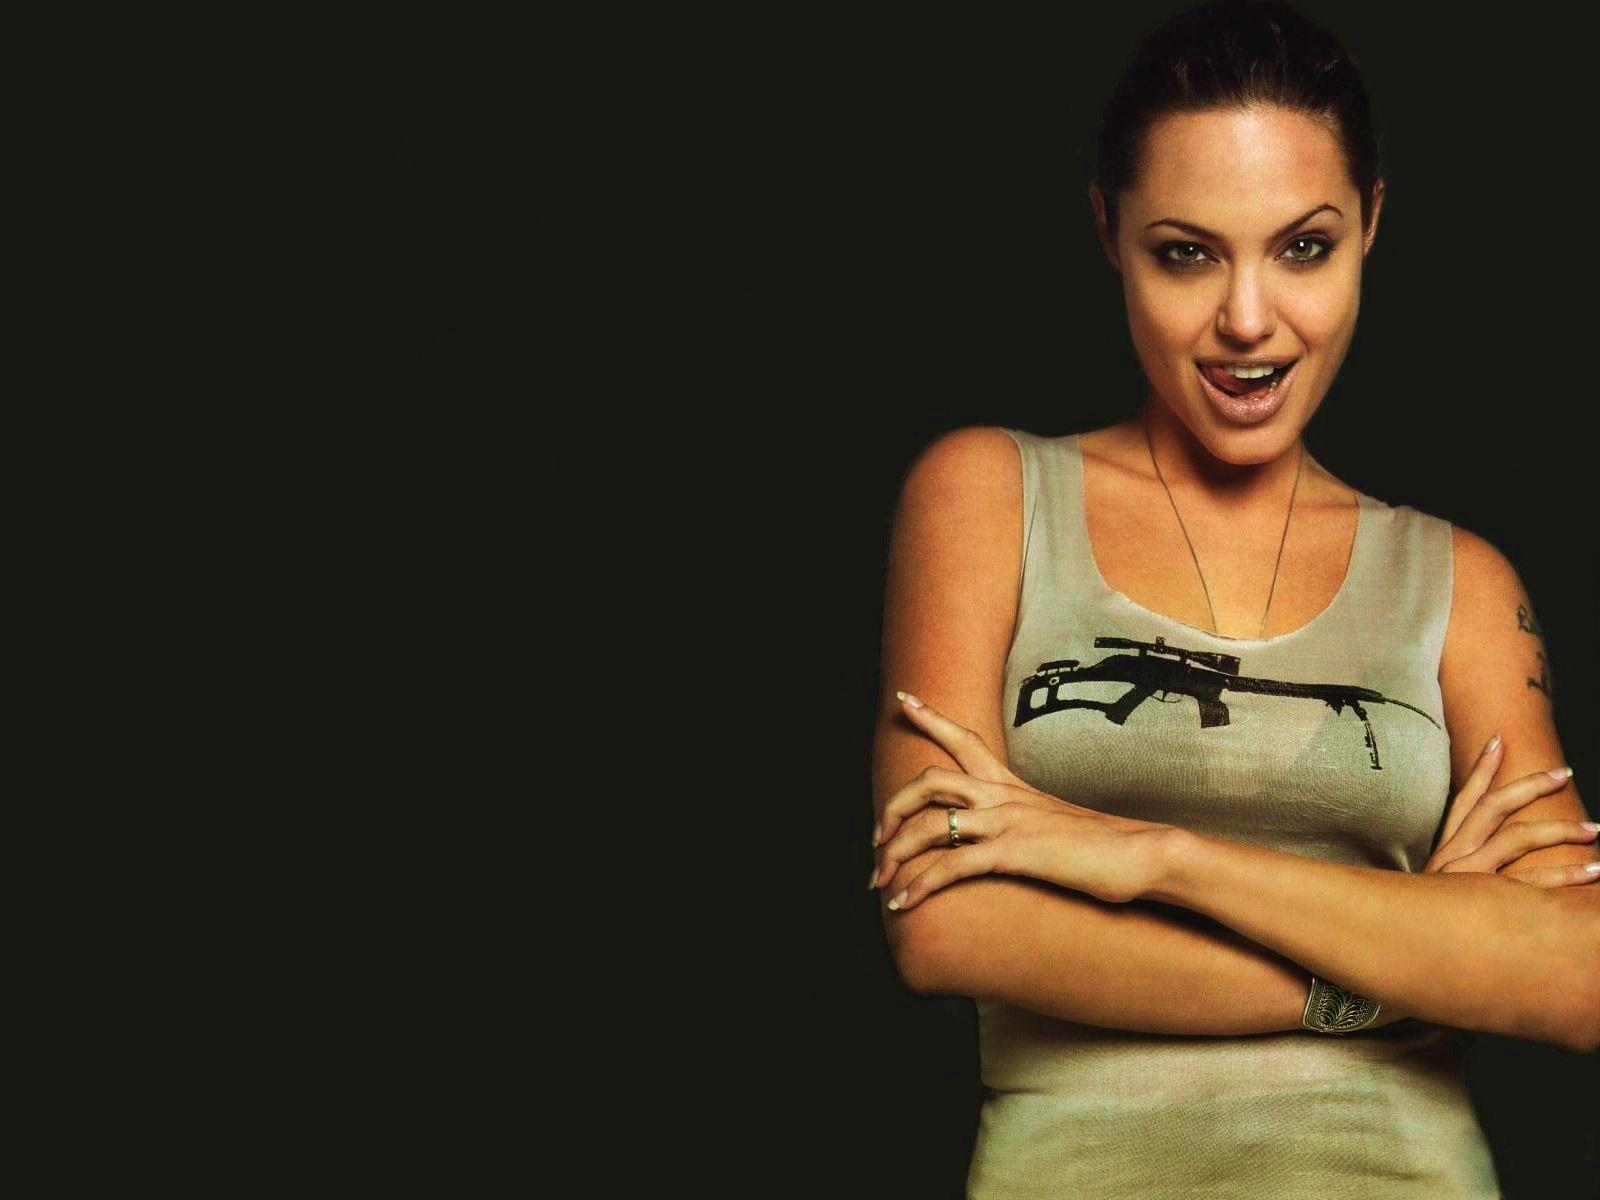 Angelina Jolie Wallpaper HD Wallpapers 1600x1200